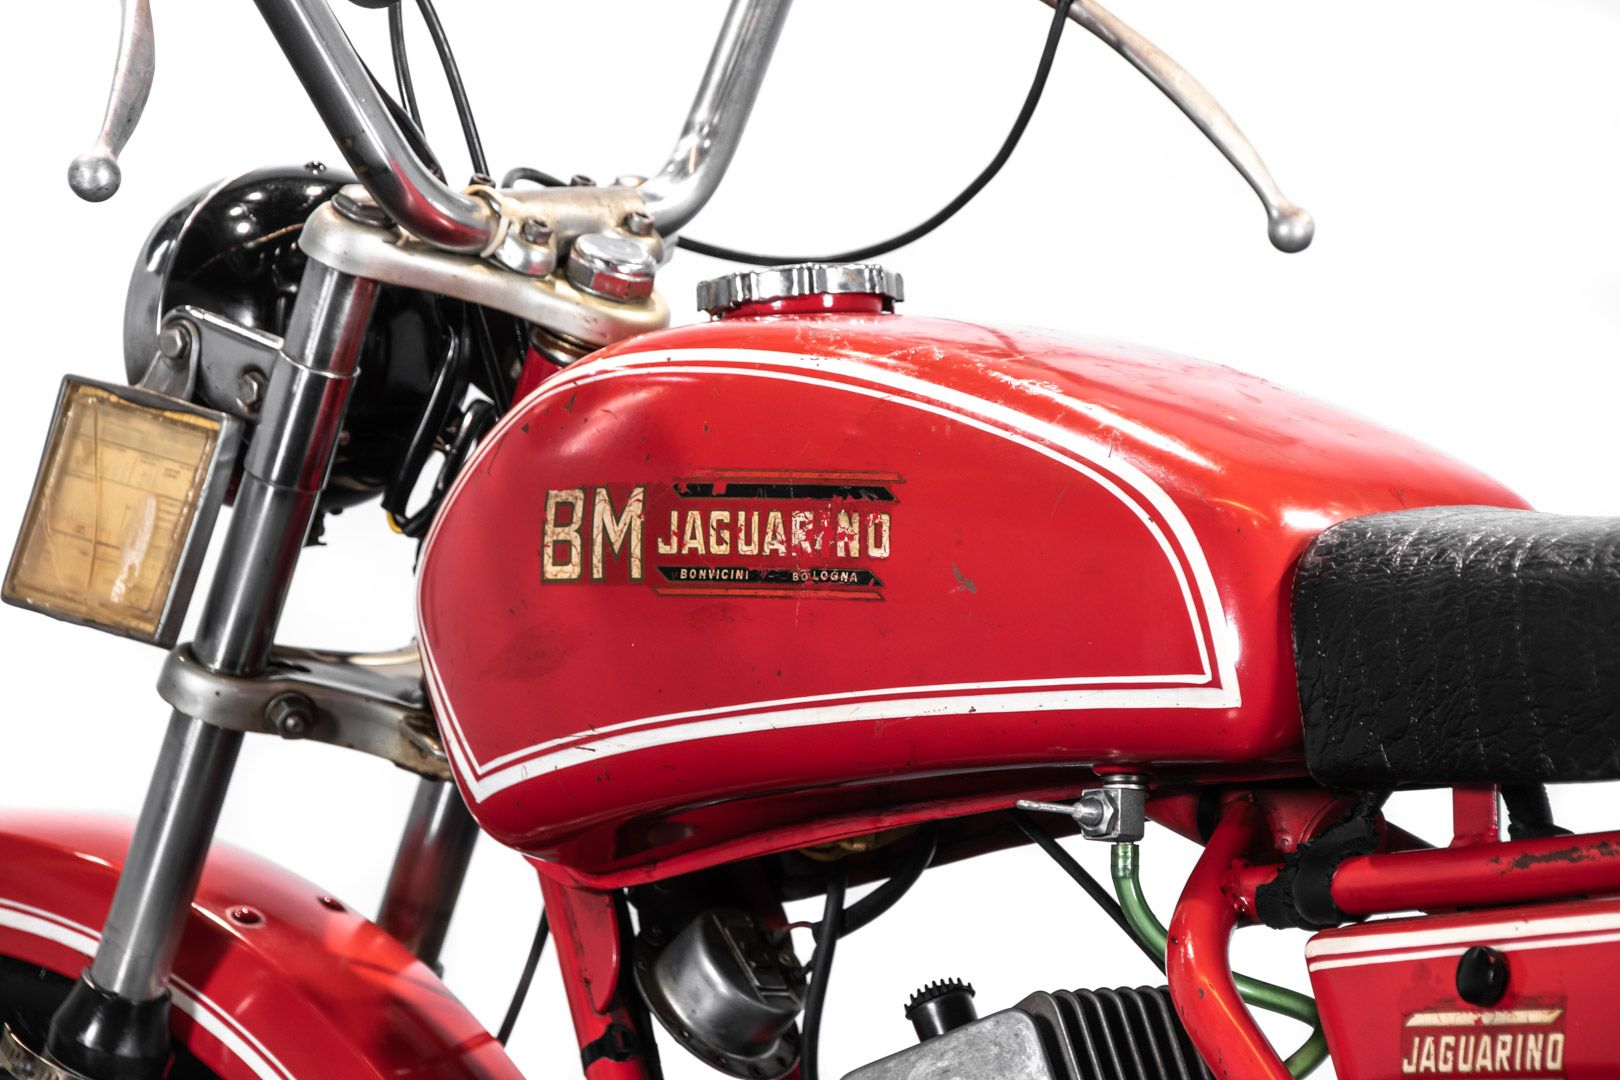 1978 Bonvicini Moto Jaguarino 50 82533